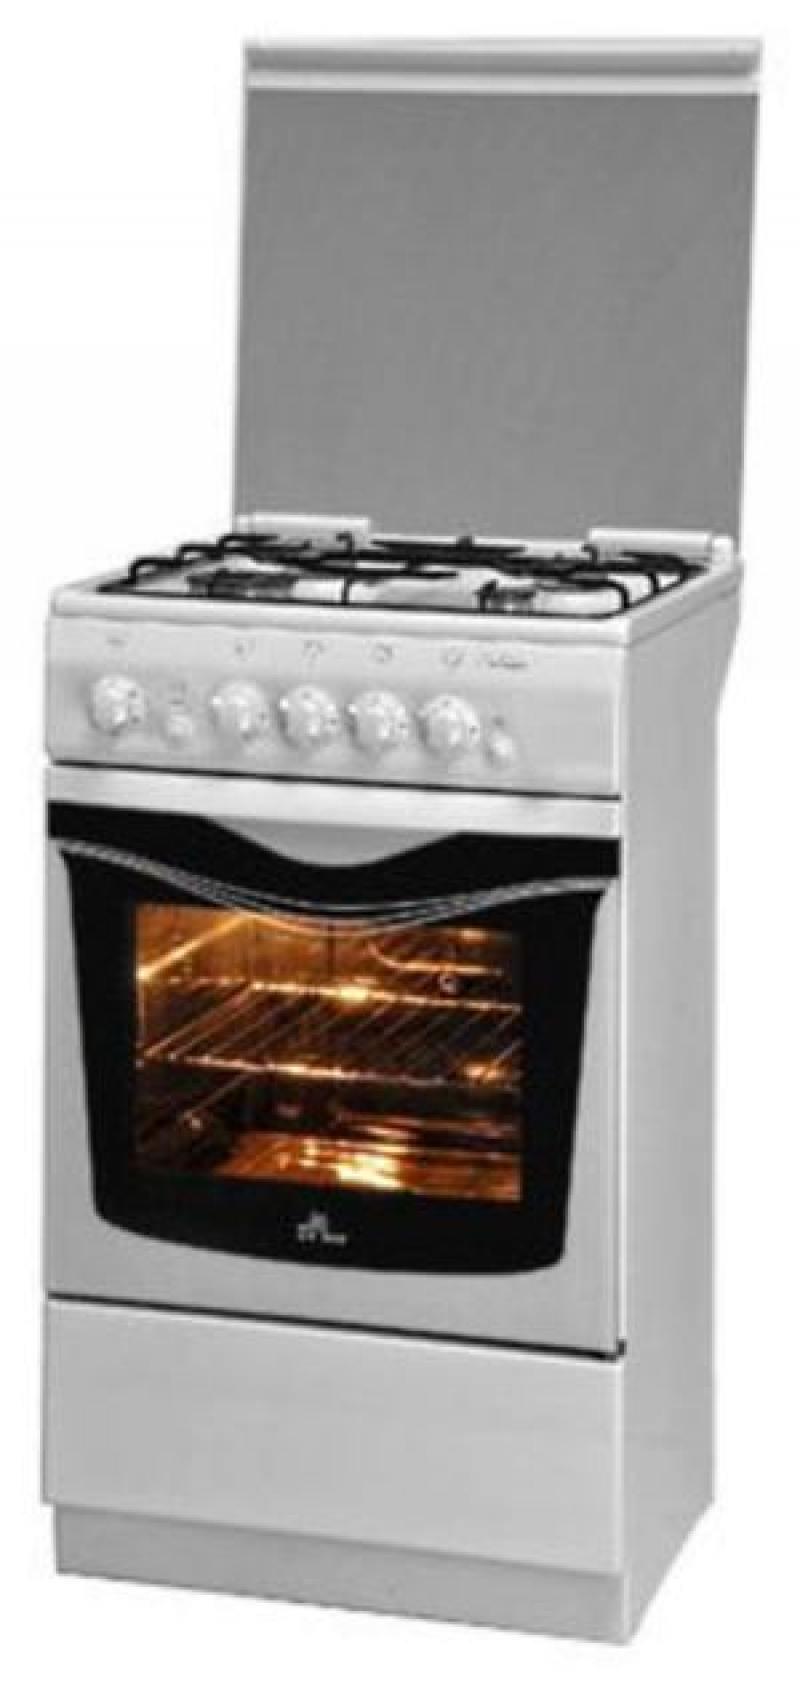 Газовая плита De Luxe 5040.36г кр камины ewt ventosa de luxe